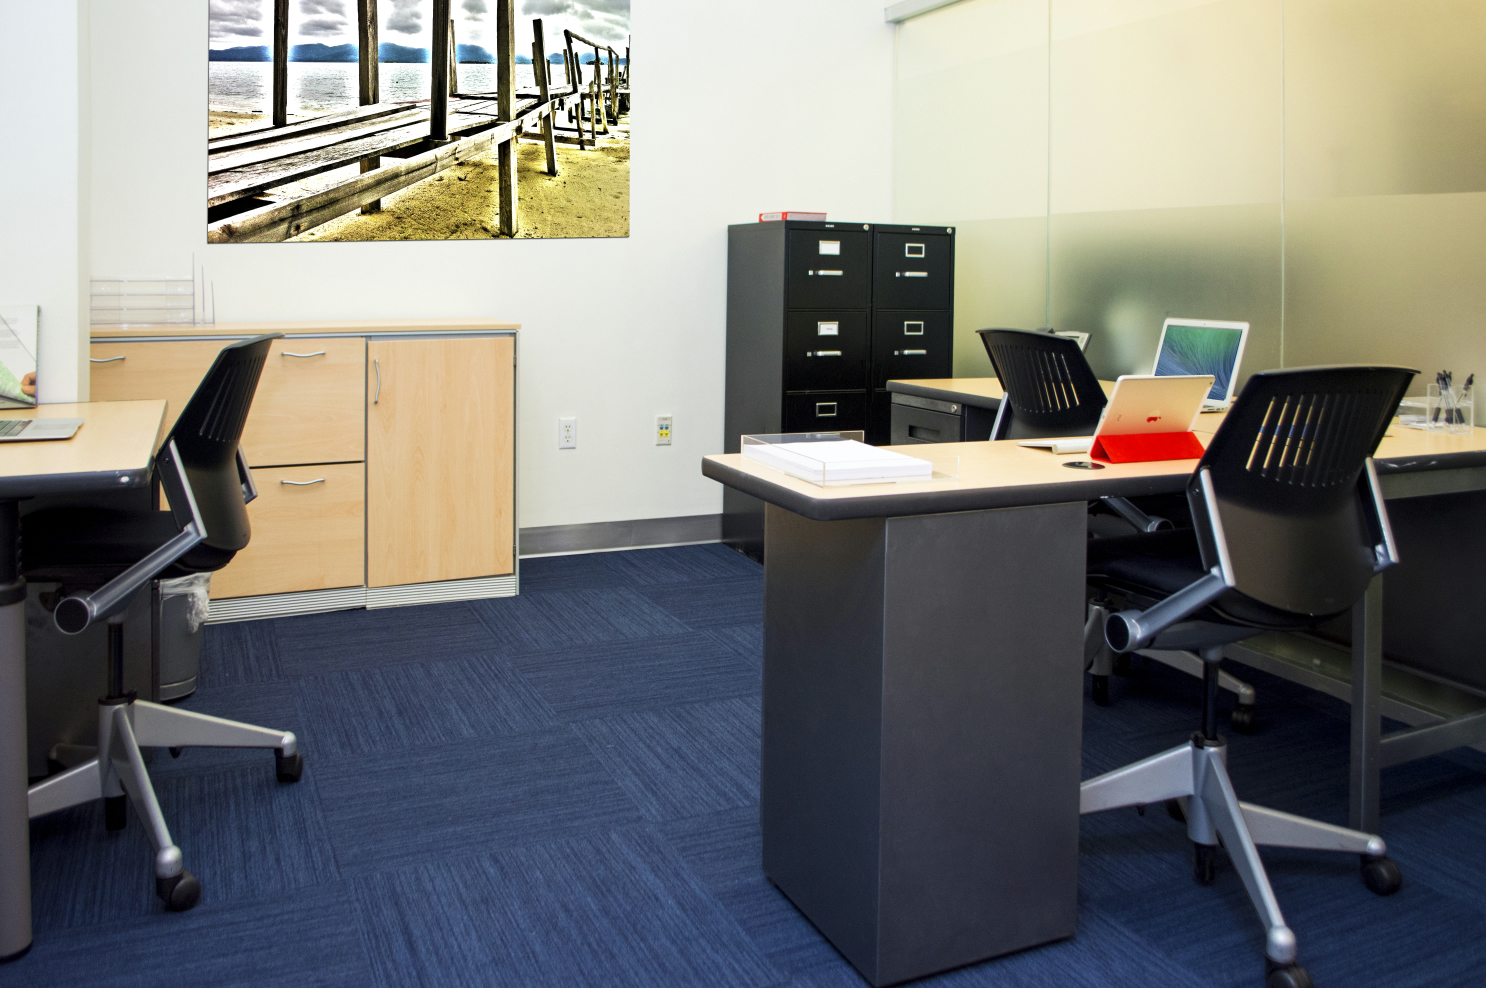 interior office w picture